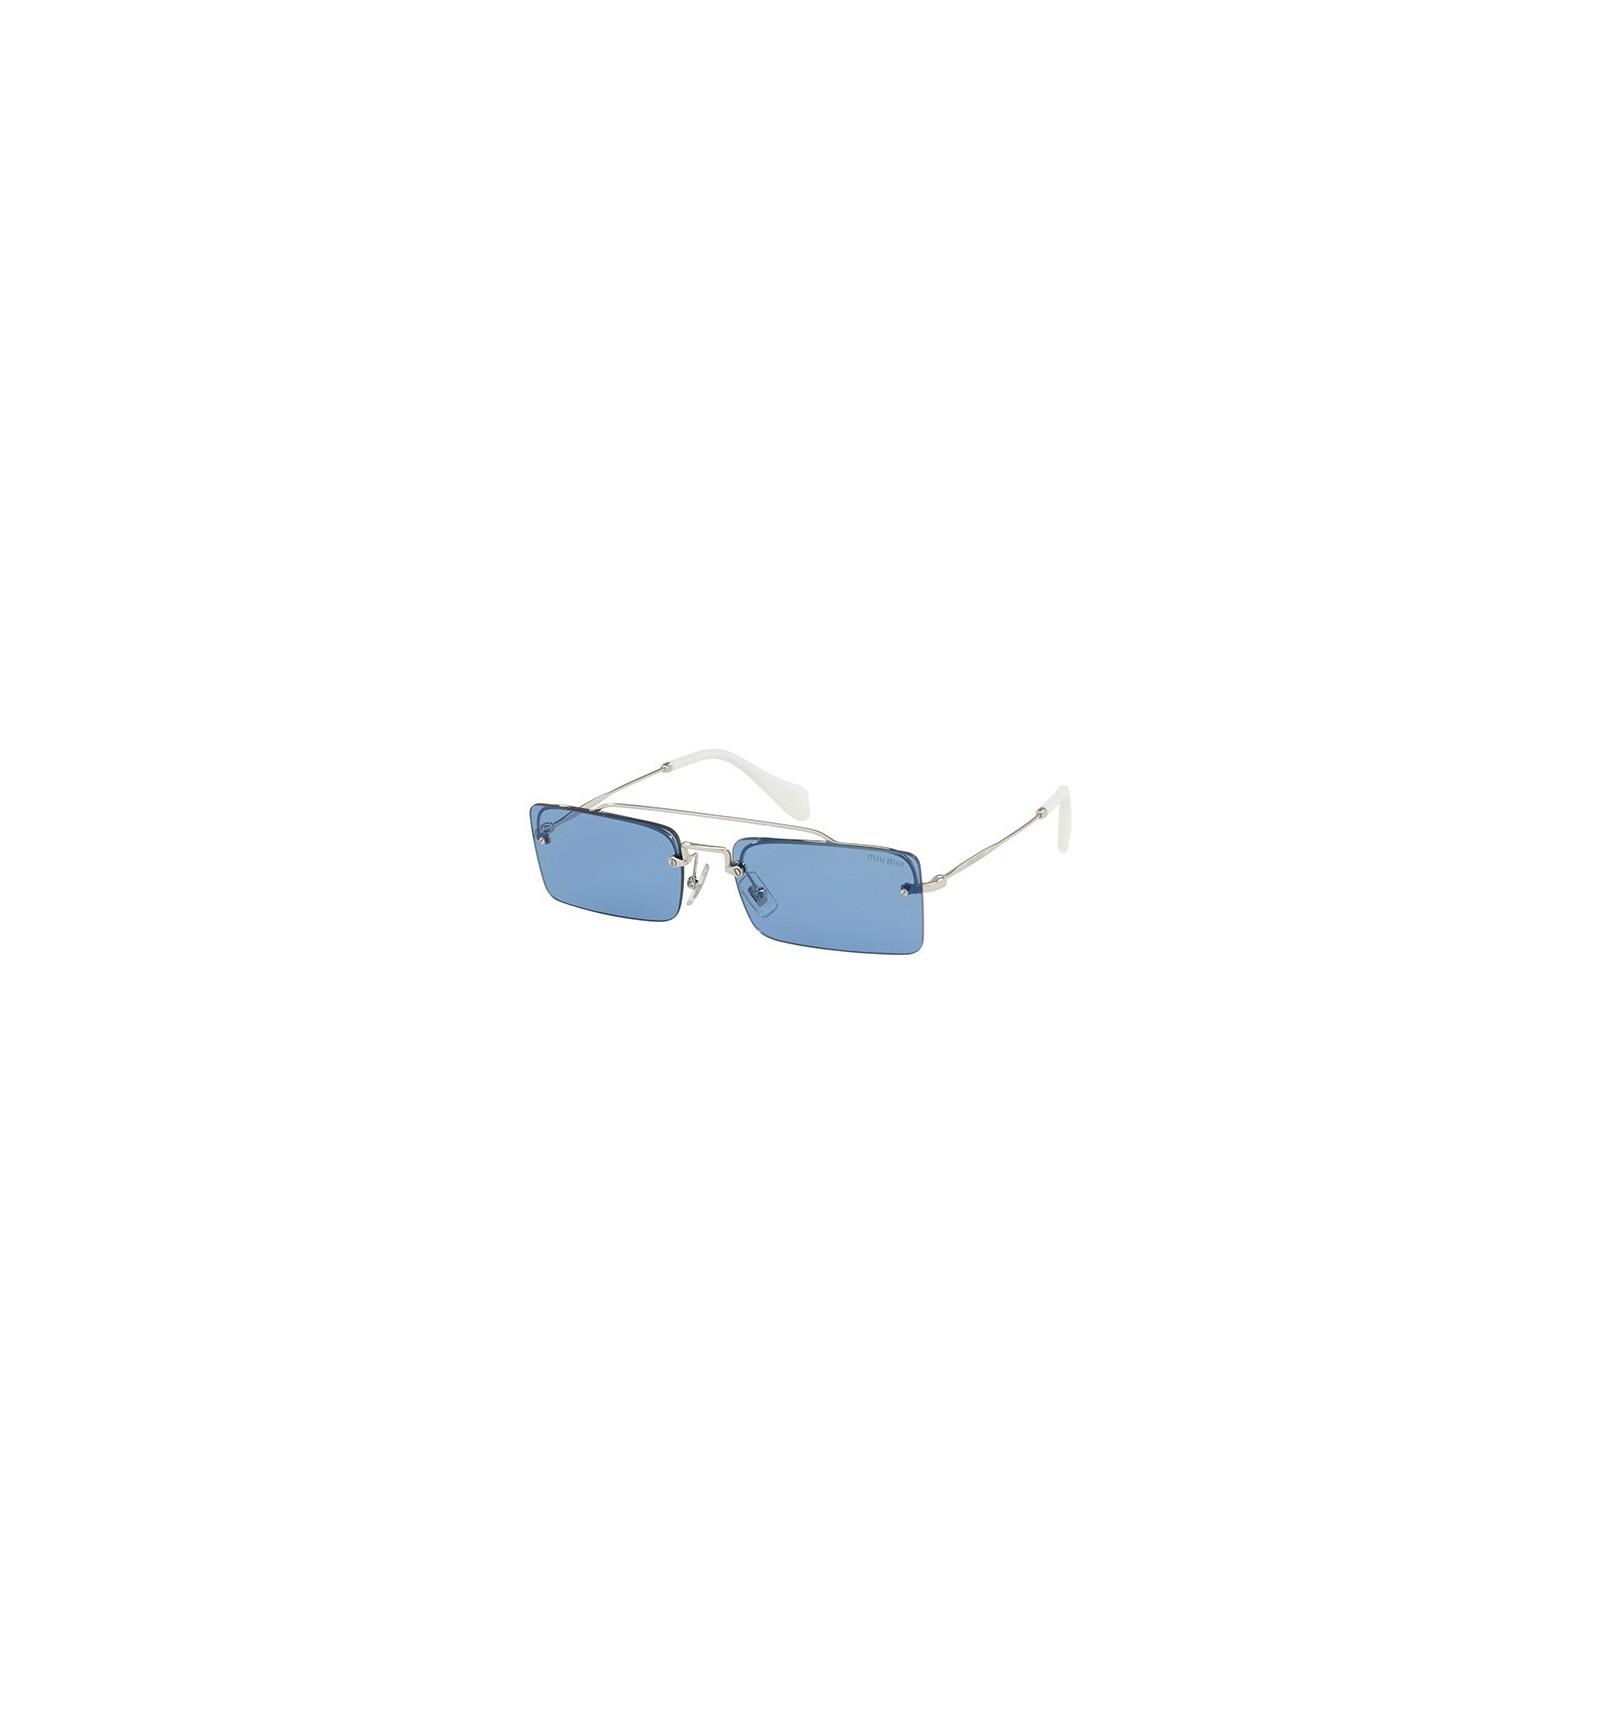 f344abce53 Gafas de sol MIU MIU SMU59T SOCIETE Silver - Light Blue. Compra Online